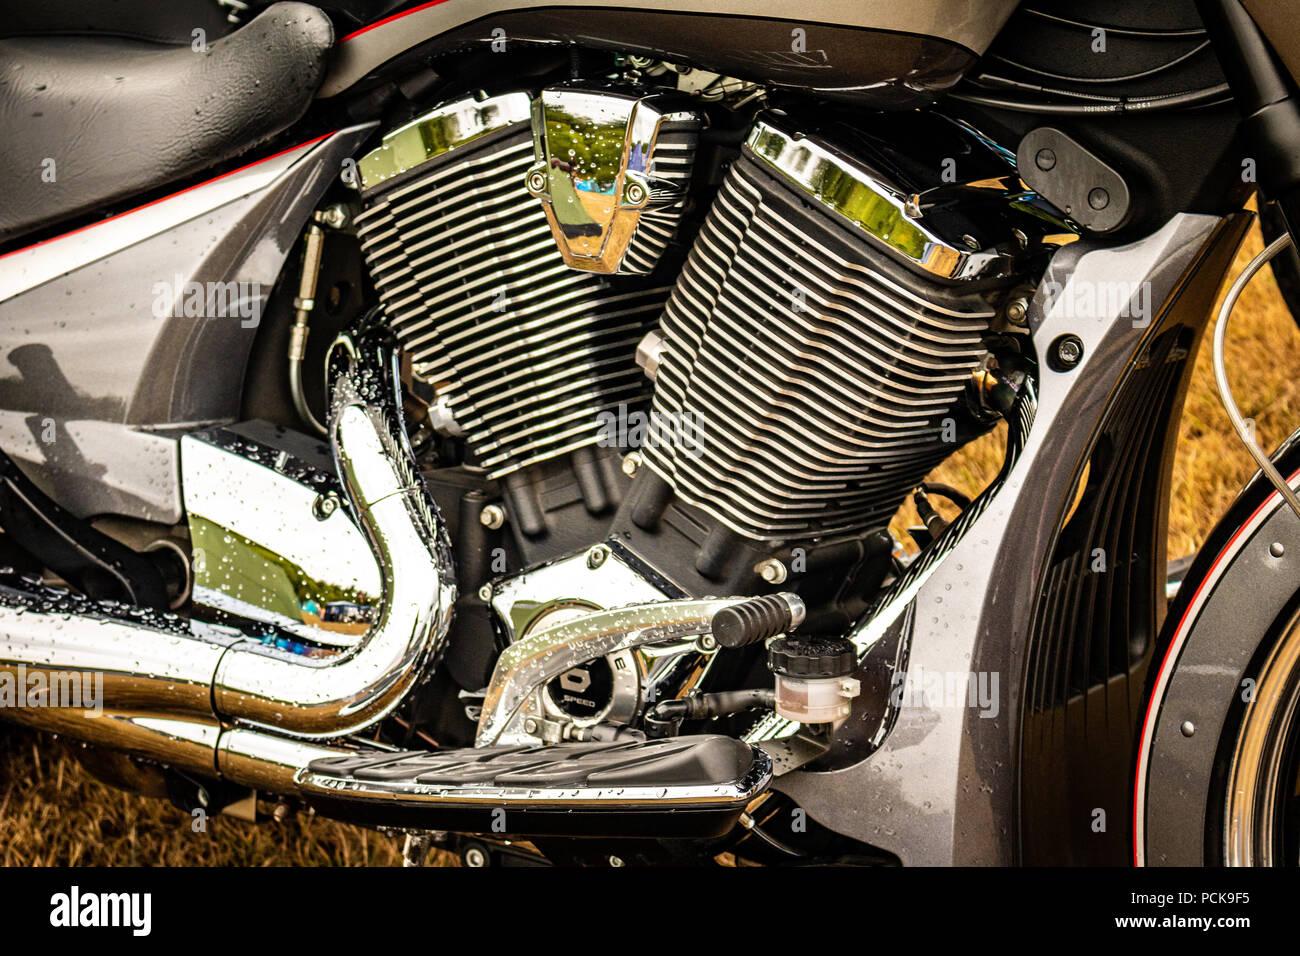 motorcycles Stock Photo